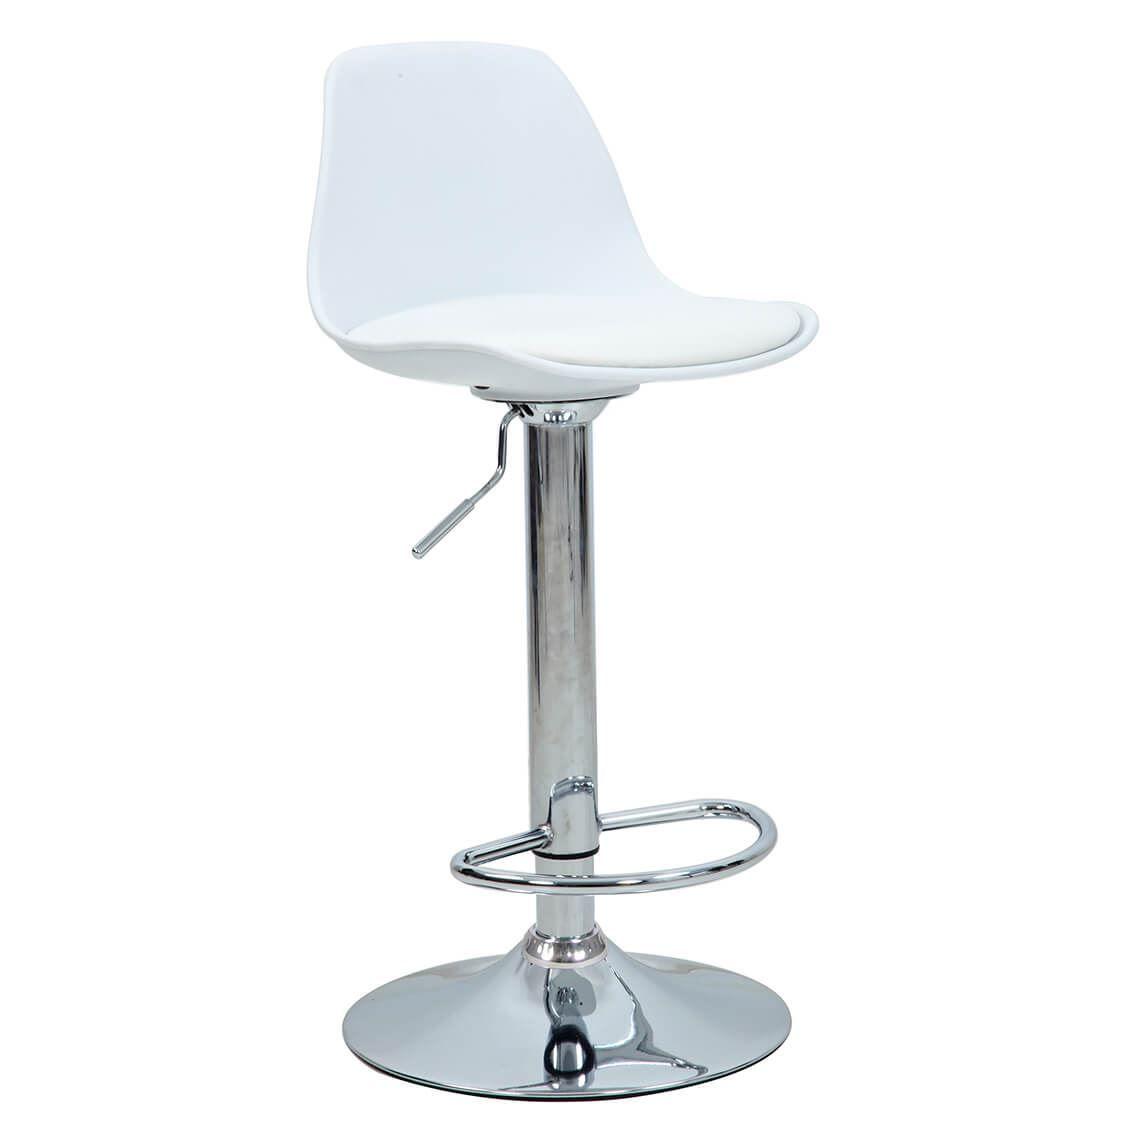 Astounding Brandon Bar Stool White In 2019 Products Bar Stools Ibusinesslaw Wood Chair Design Ideas Ibusinesslaworg